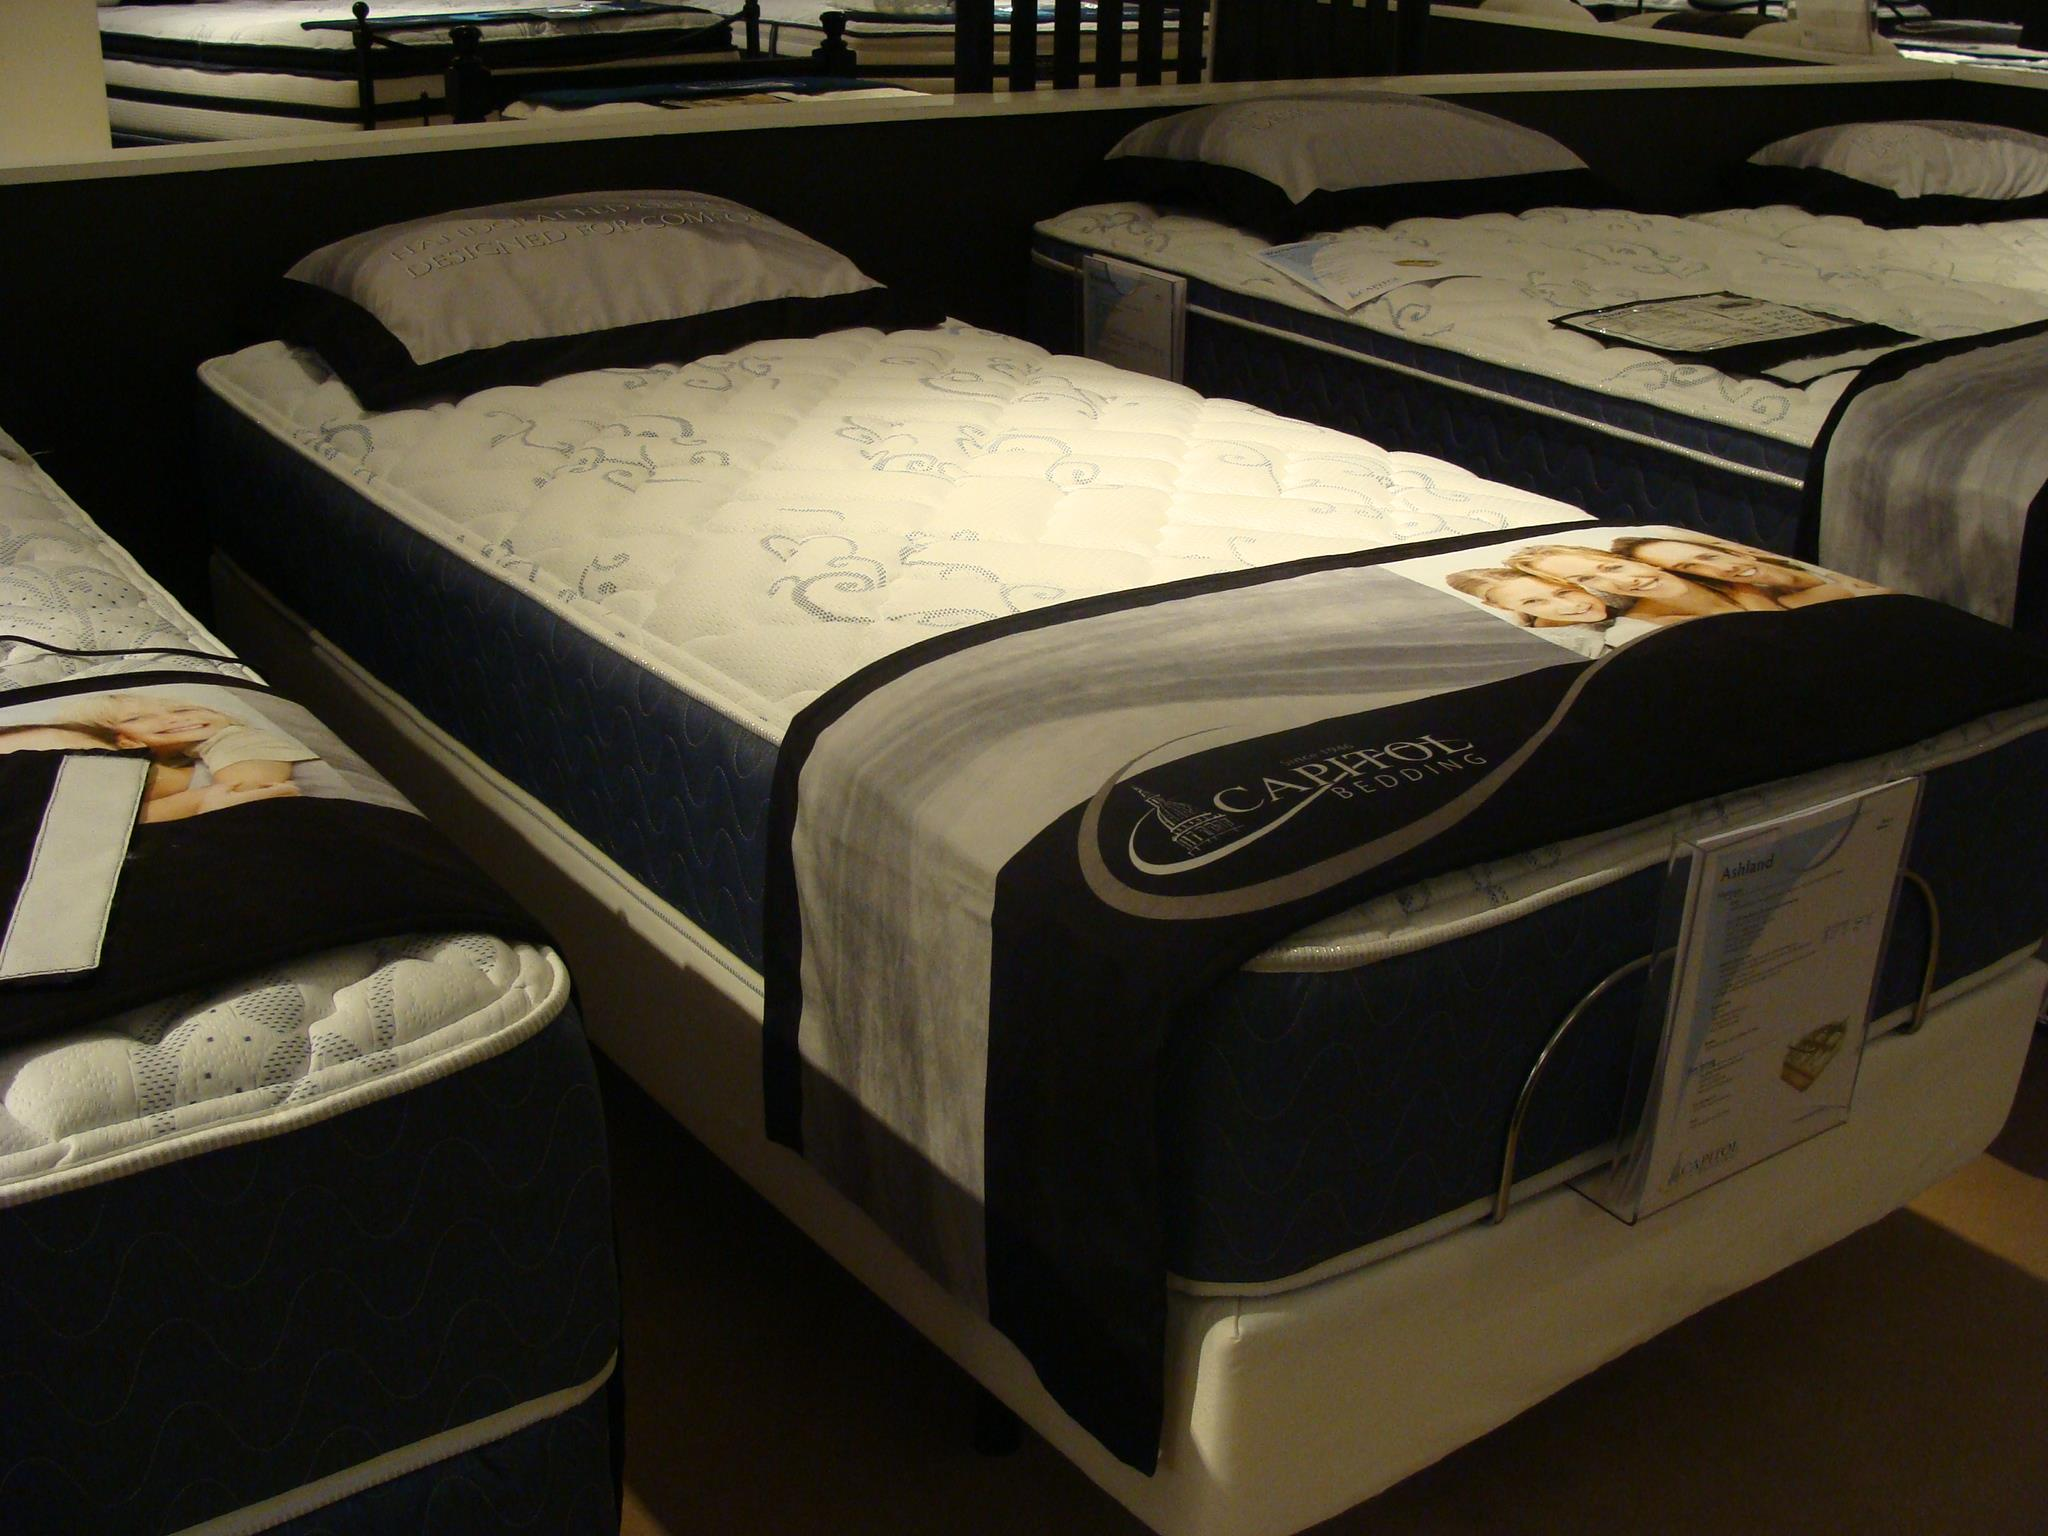 Capitol Bedding Ashland Full Mattress Only - Item Number: VertiCoil-F